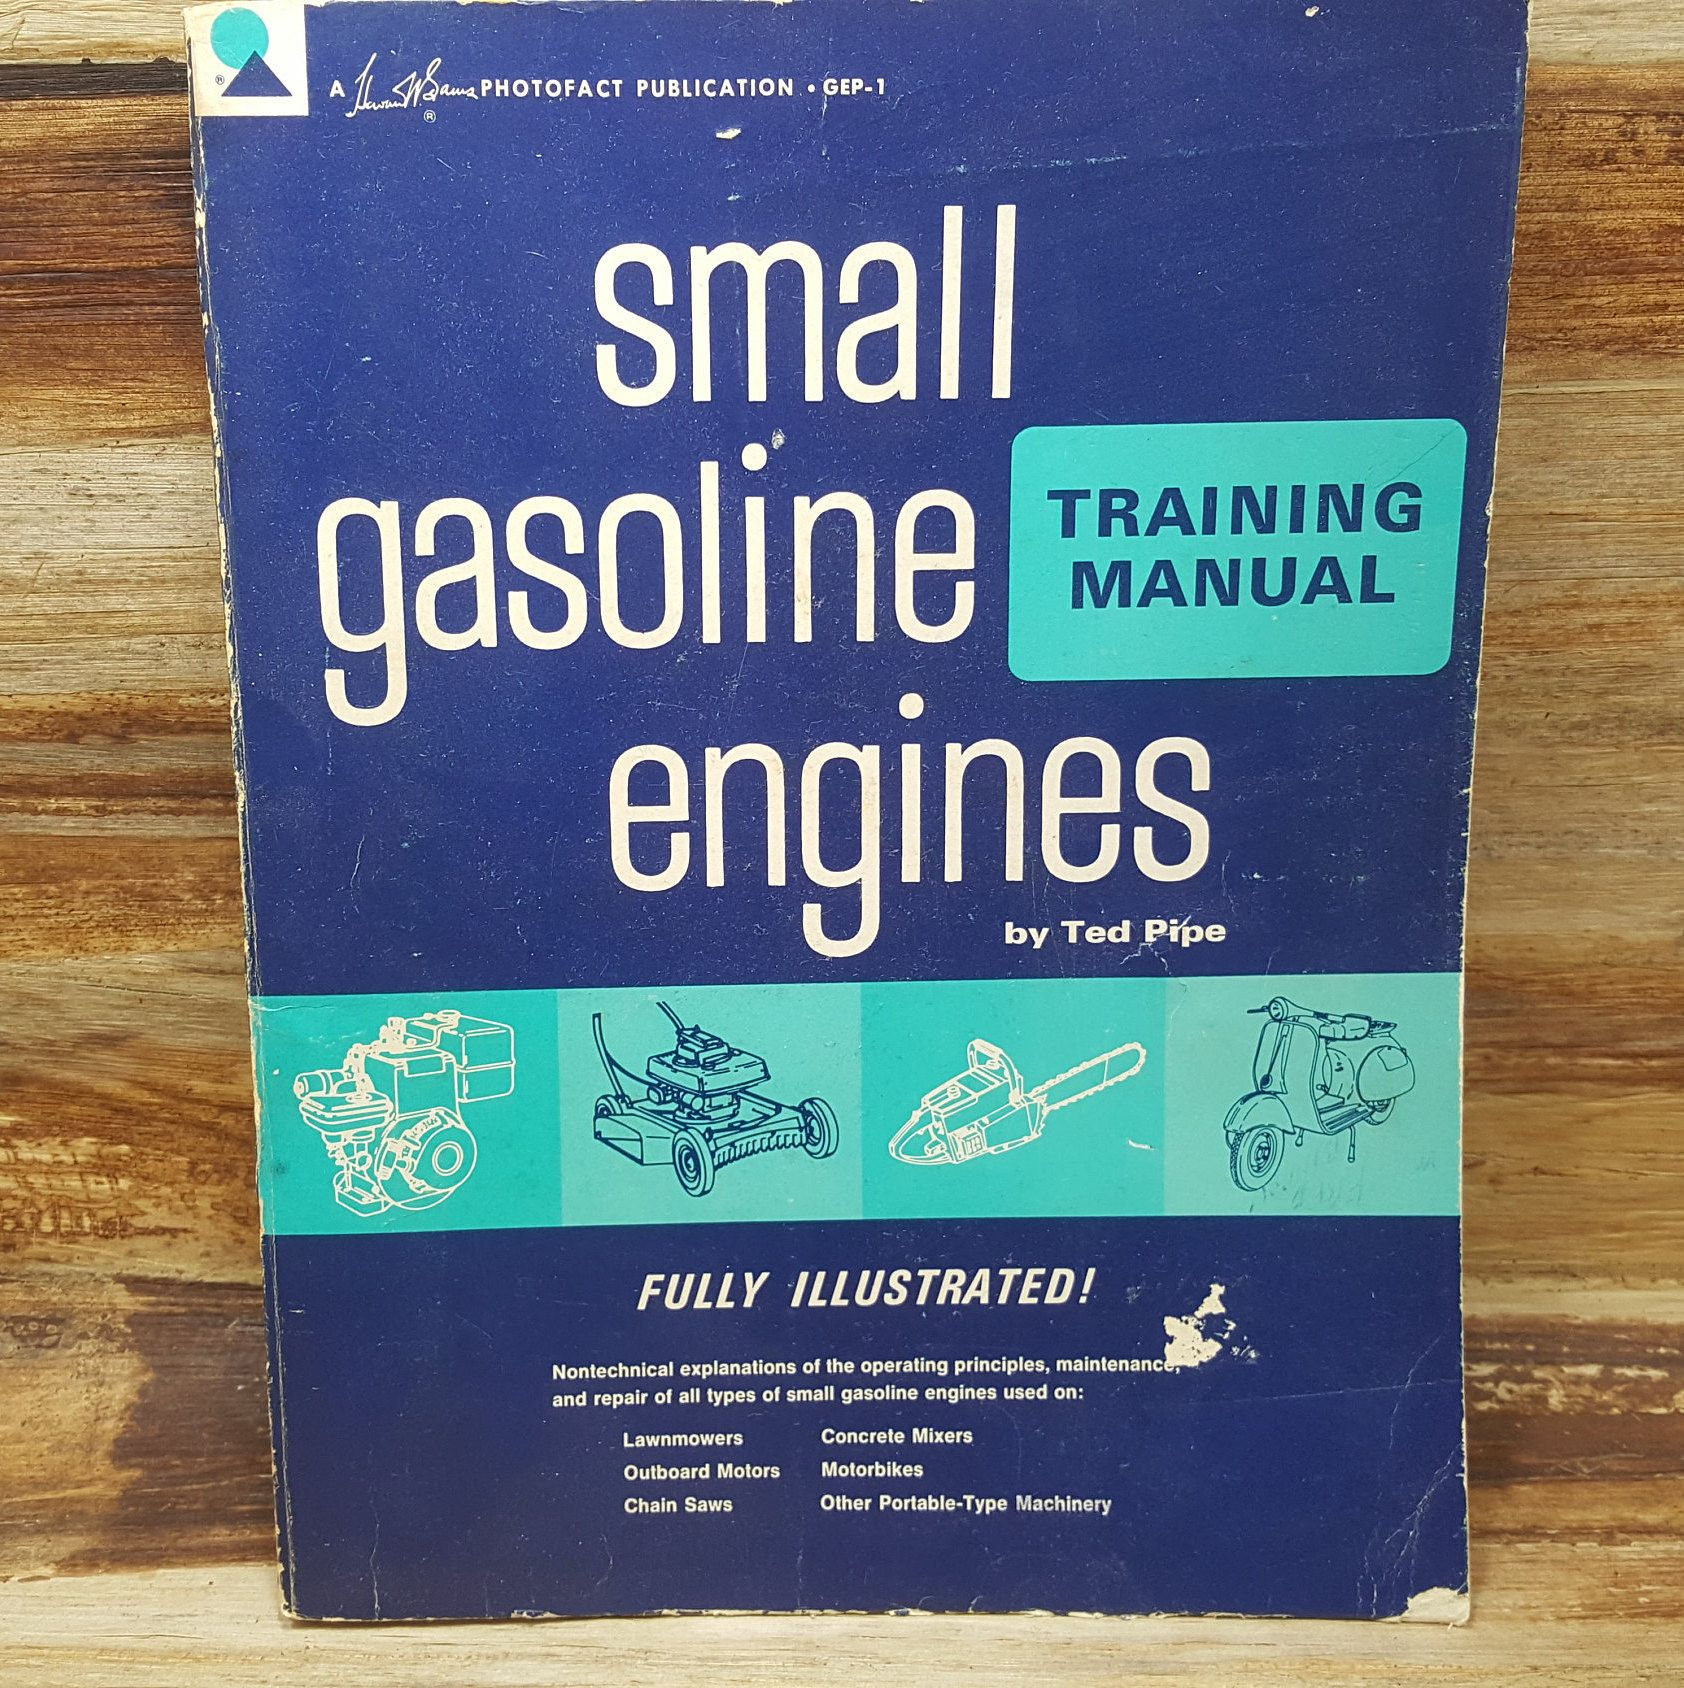 small gasoline engines 1966 training manual vintage car etsy gasoline engine vintage cars engineering pinterest